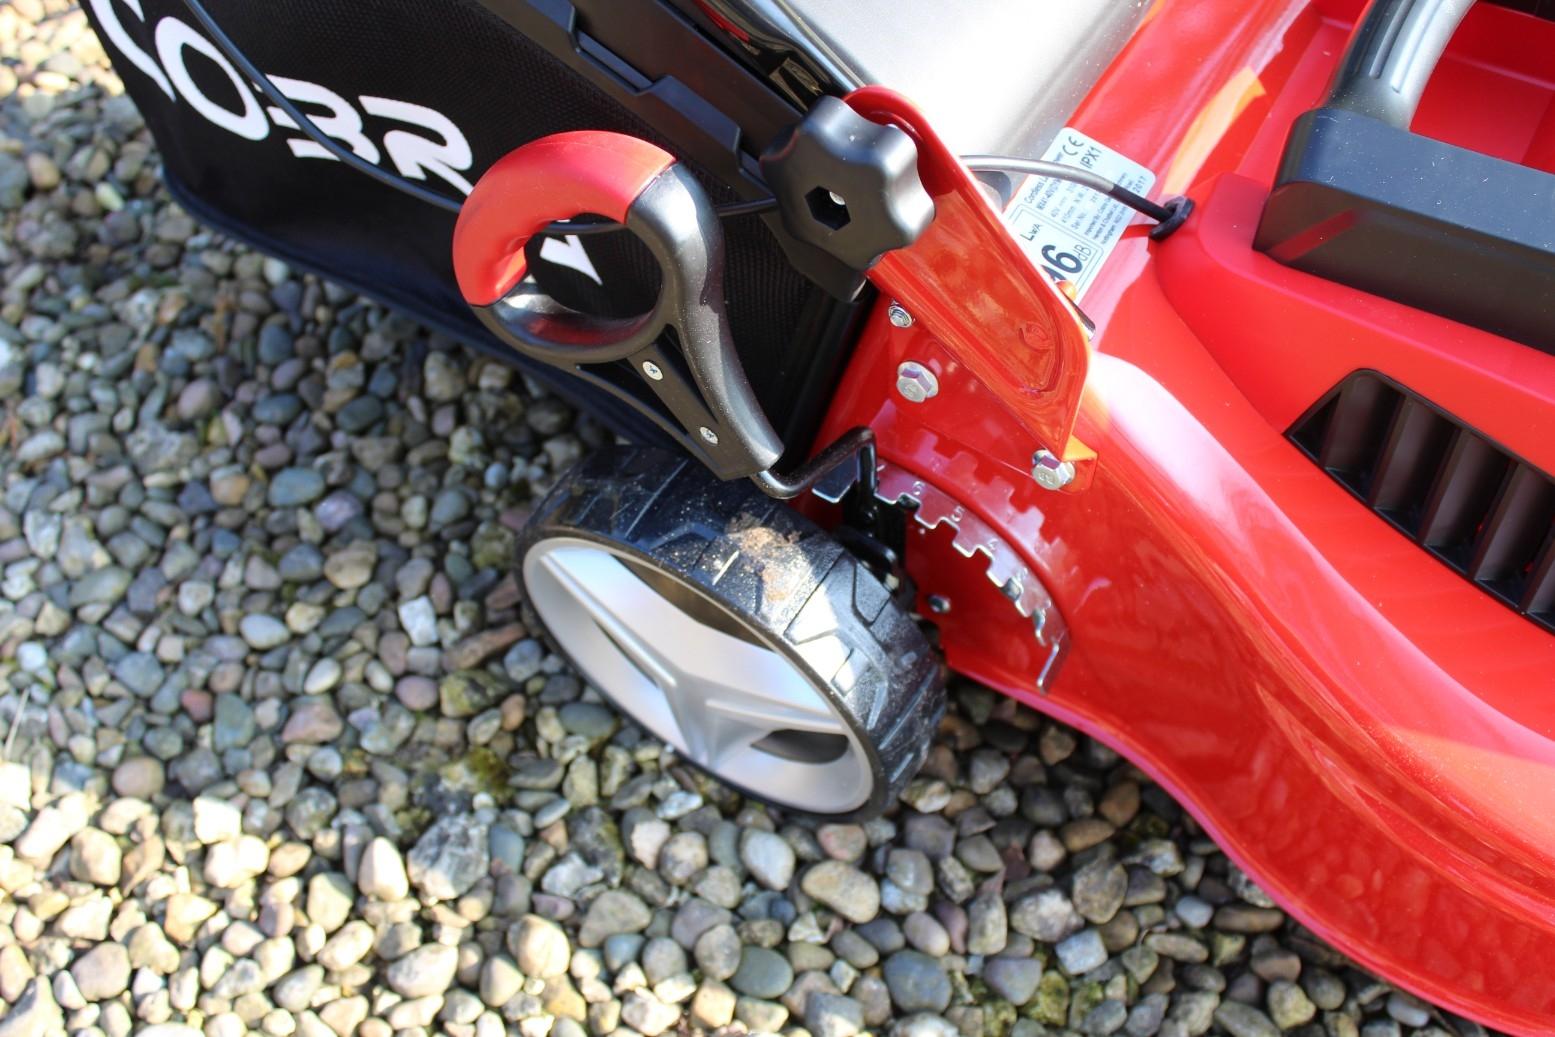 Cobra MX4140V Lithium-ion 40V Cordless Lawnmower - Review (4)